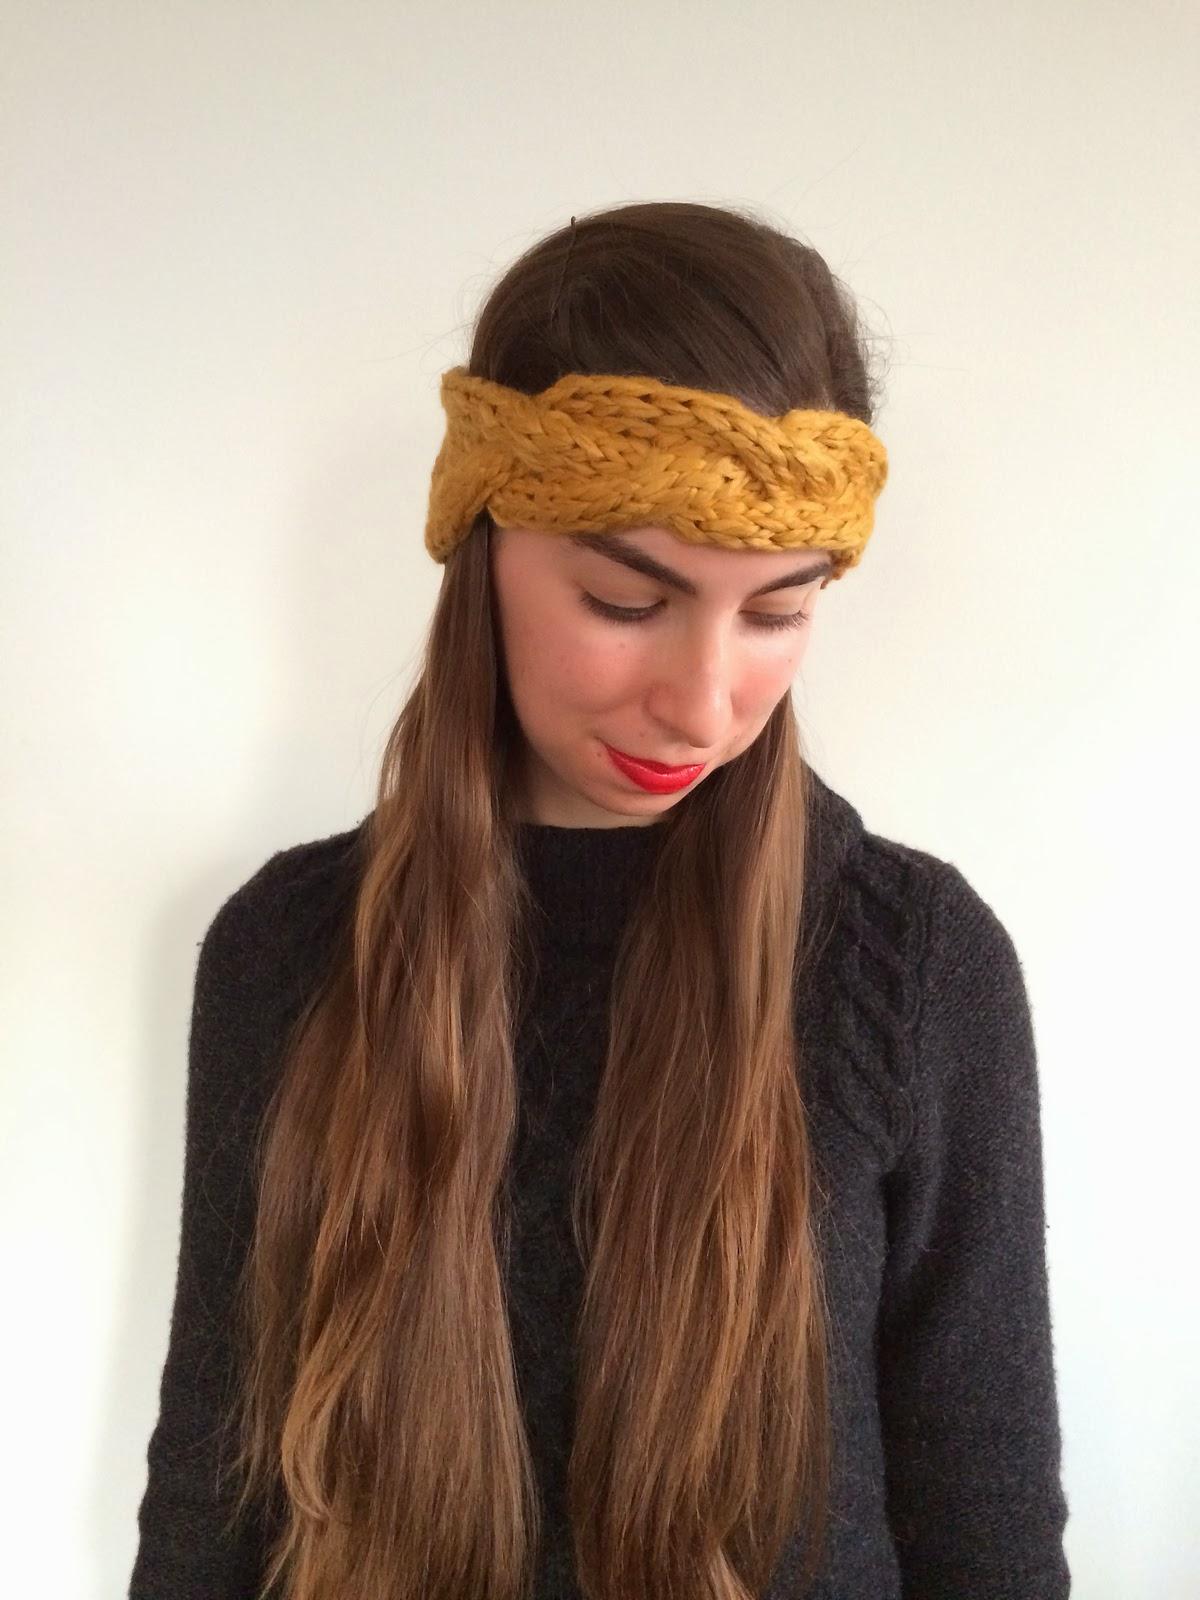 anna knits, etc.: top braided headband pattern